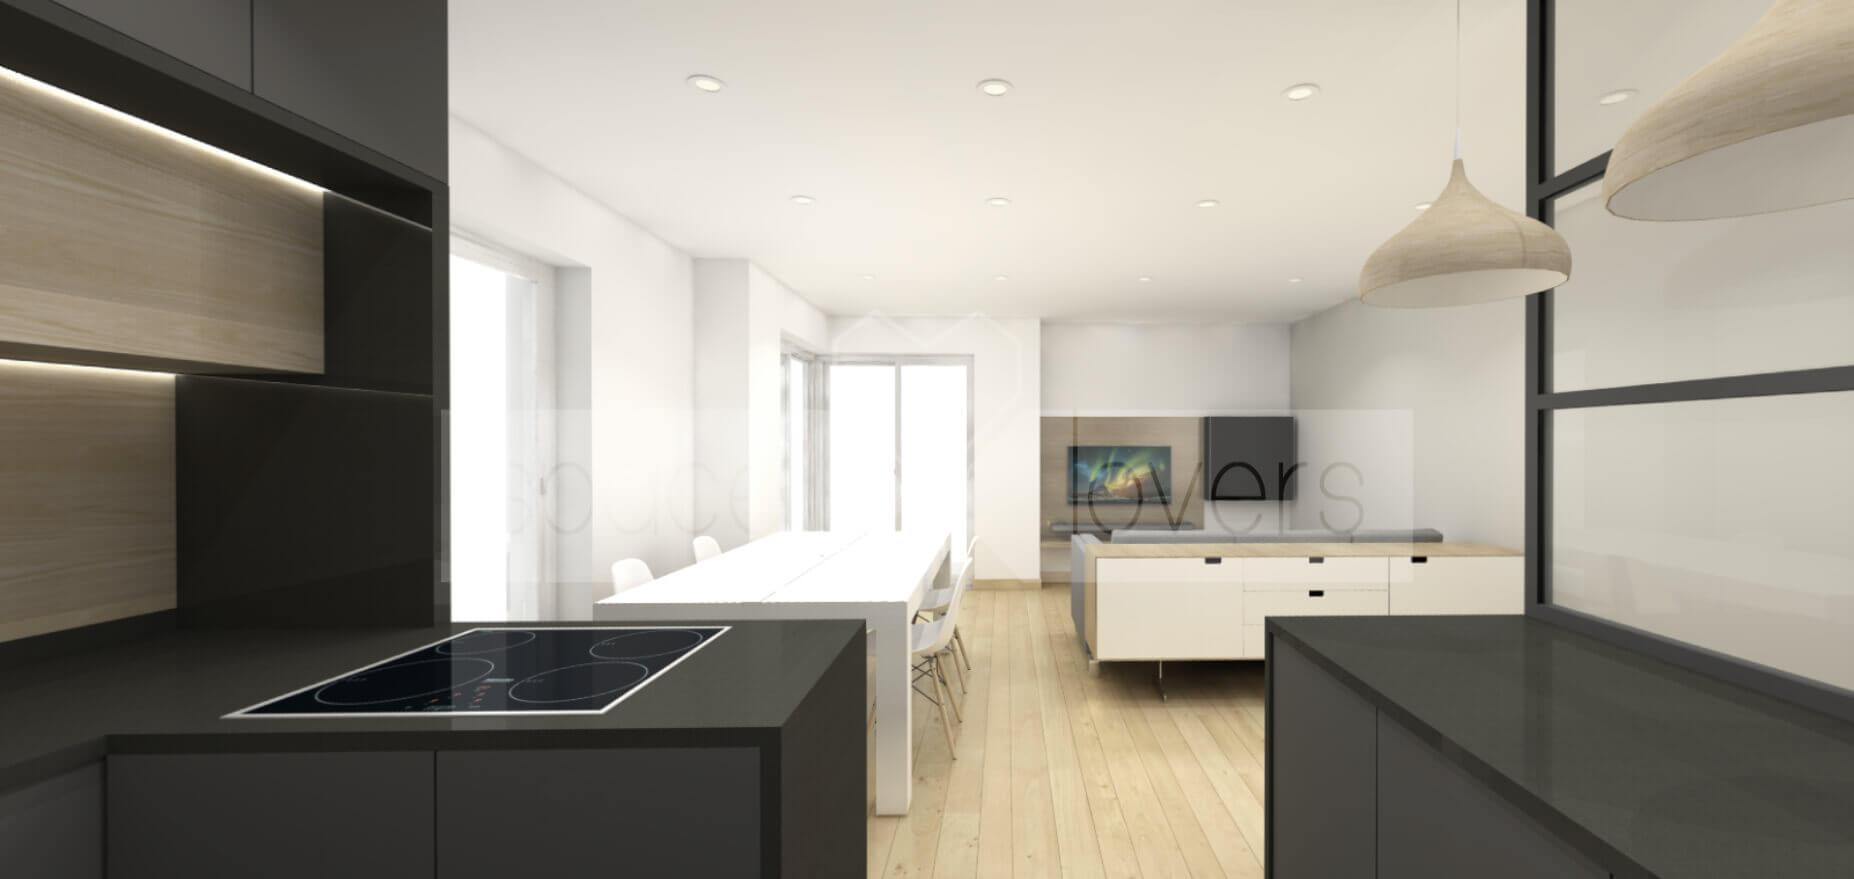 remodelacao-apartamento-parque-das-nacoes-lisboa-cozinha-sala-open-space